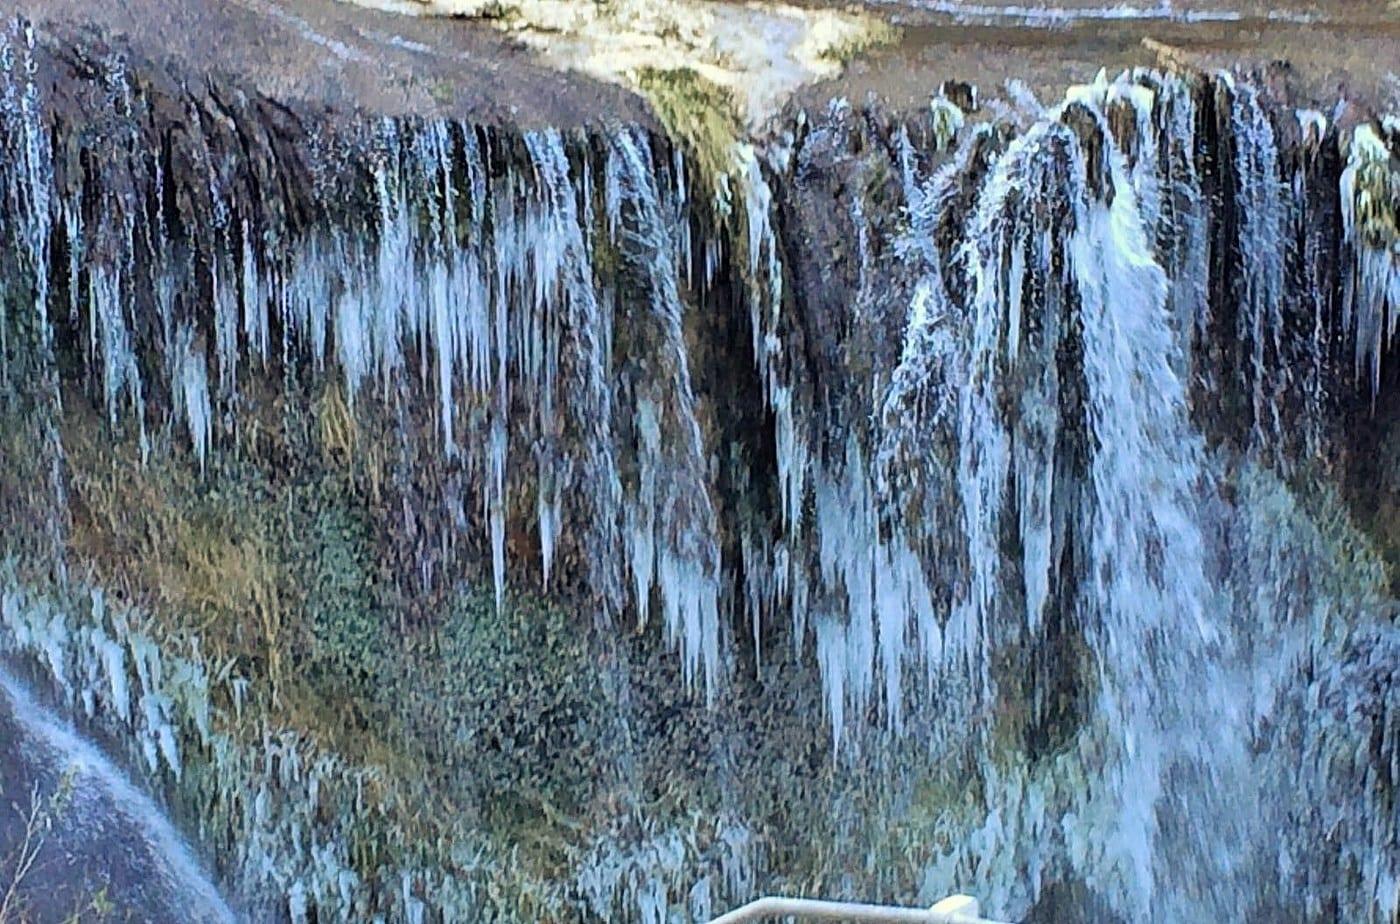 https://i0.wp.com/www.umbriaon.it/2015/wp-content/uploads/2017/01/Cascata-delle-Marmore-ghiacciata-gelo-7-gennaio-2017-4.jpg